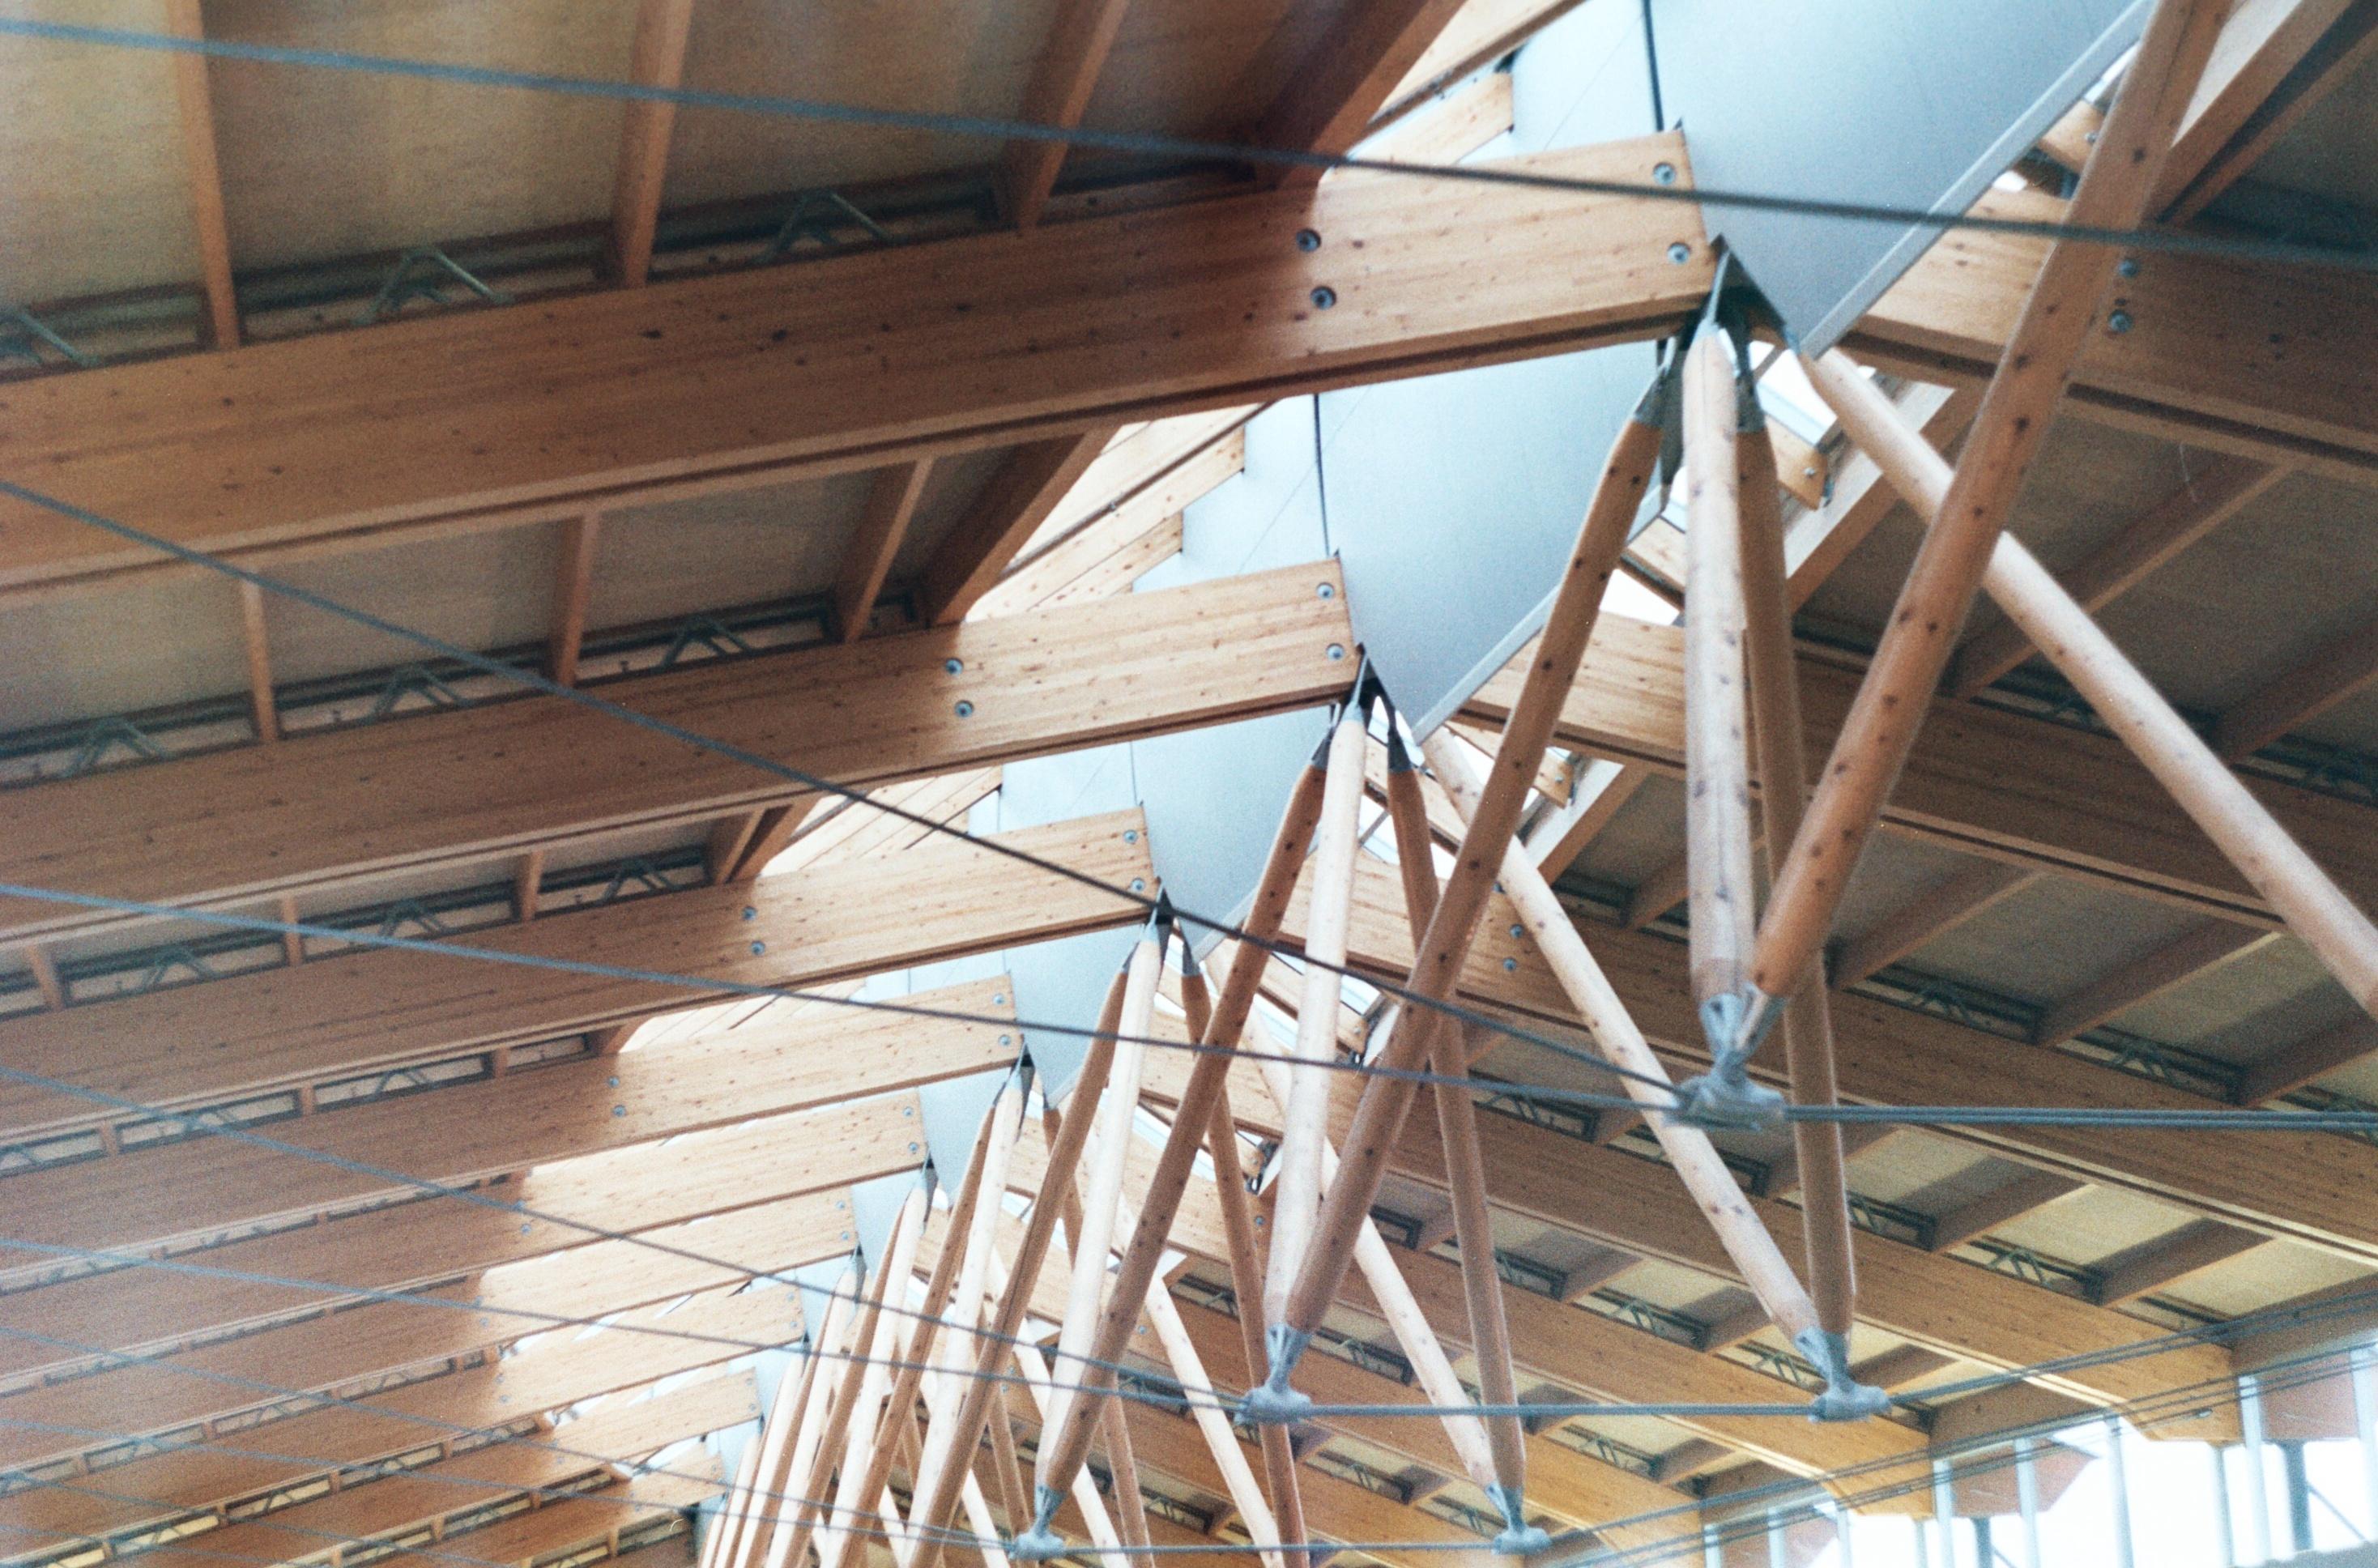 fotos gratis madera techo pelcula enviar haz mstil pretil escalera vigas cscara manual urss helios trmino anlogo zenitb